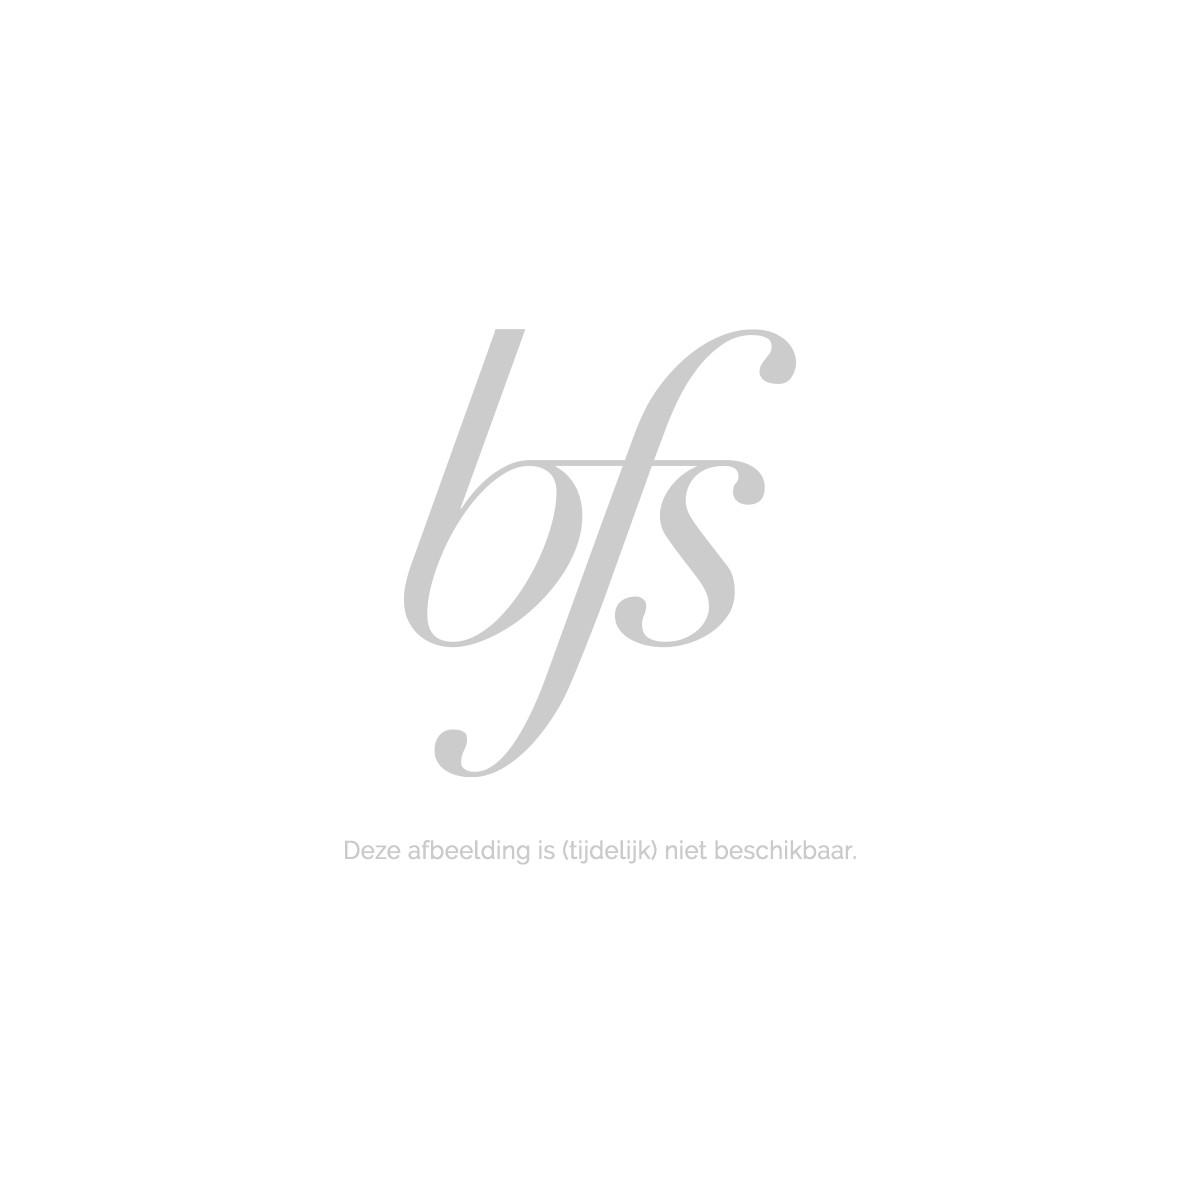 Dior Sauvage Deodorant 75 gr